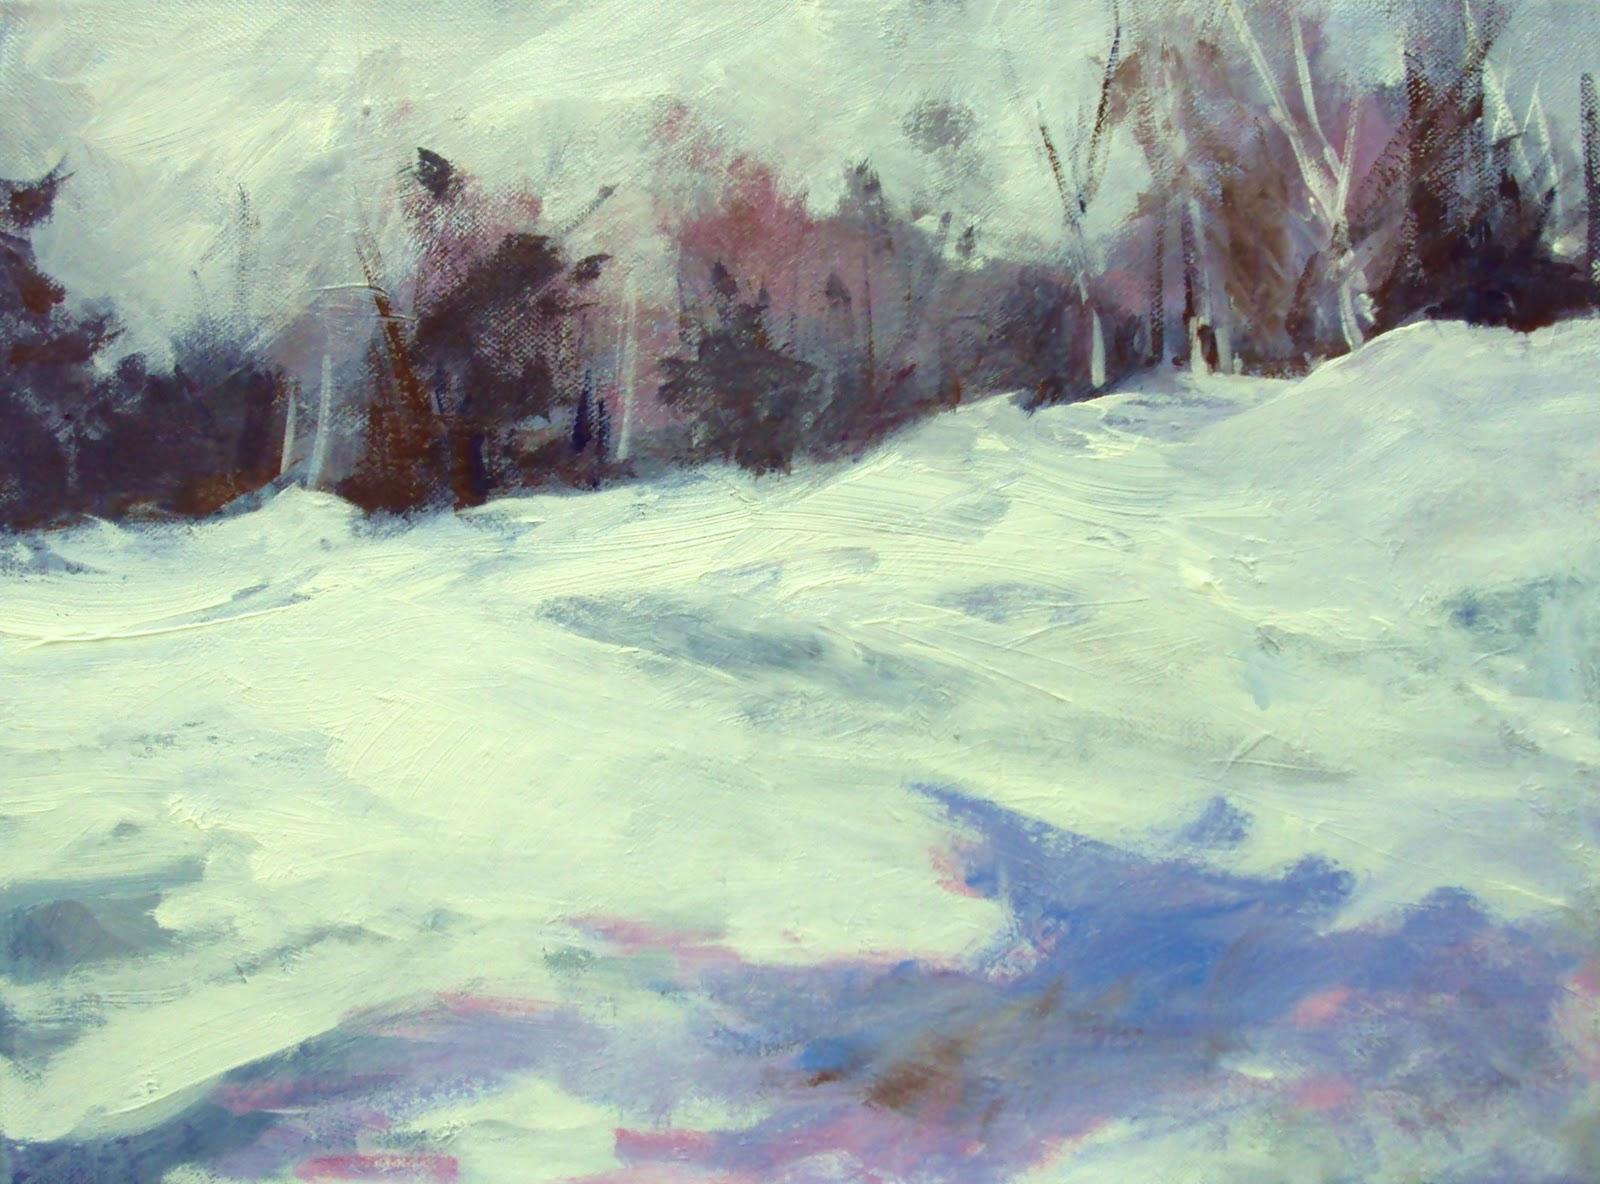 """Beautiful winter"" original fine art by Parastoo Ganjei"